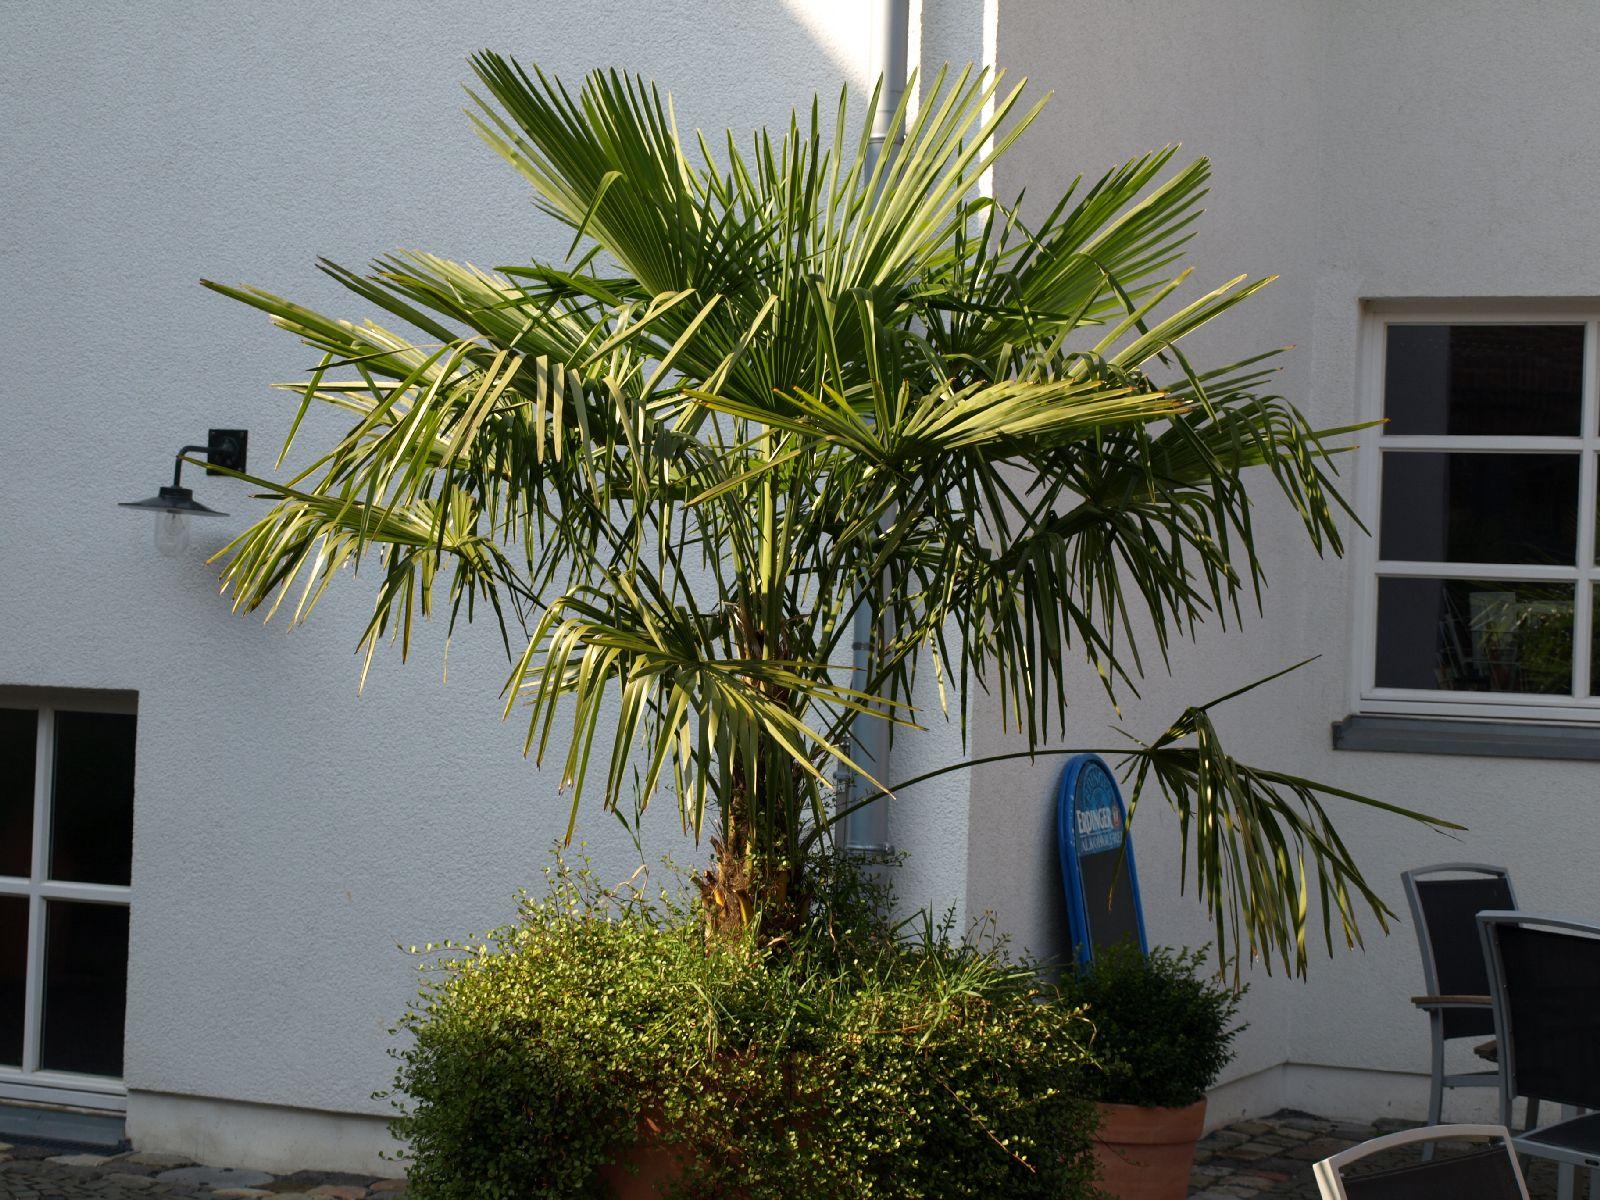 Pflanzen-Baum-Foto_Textur_B_P9205290